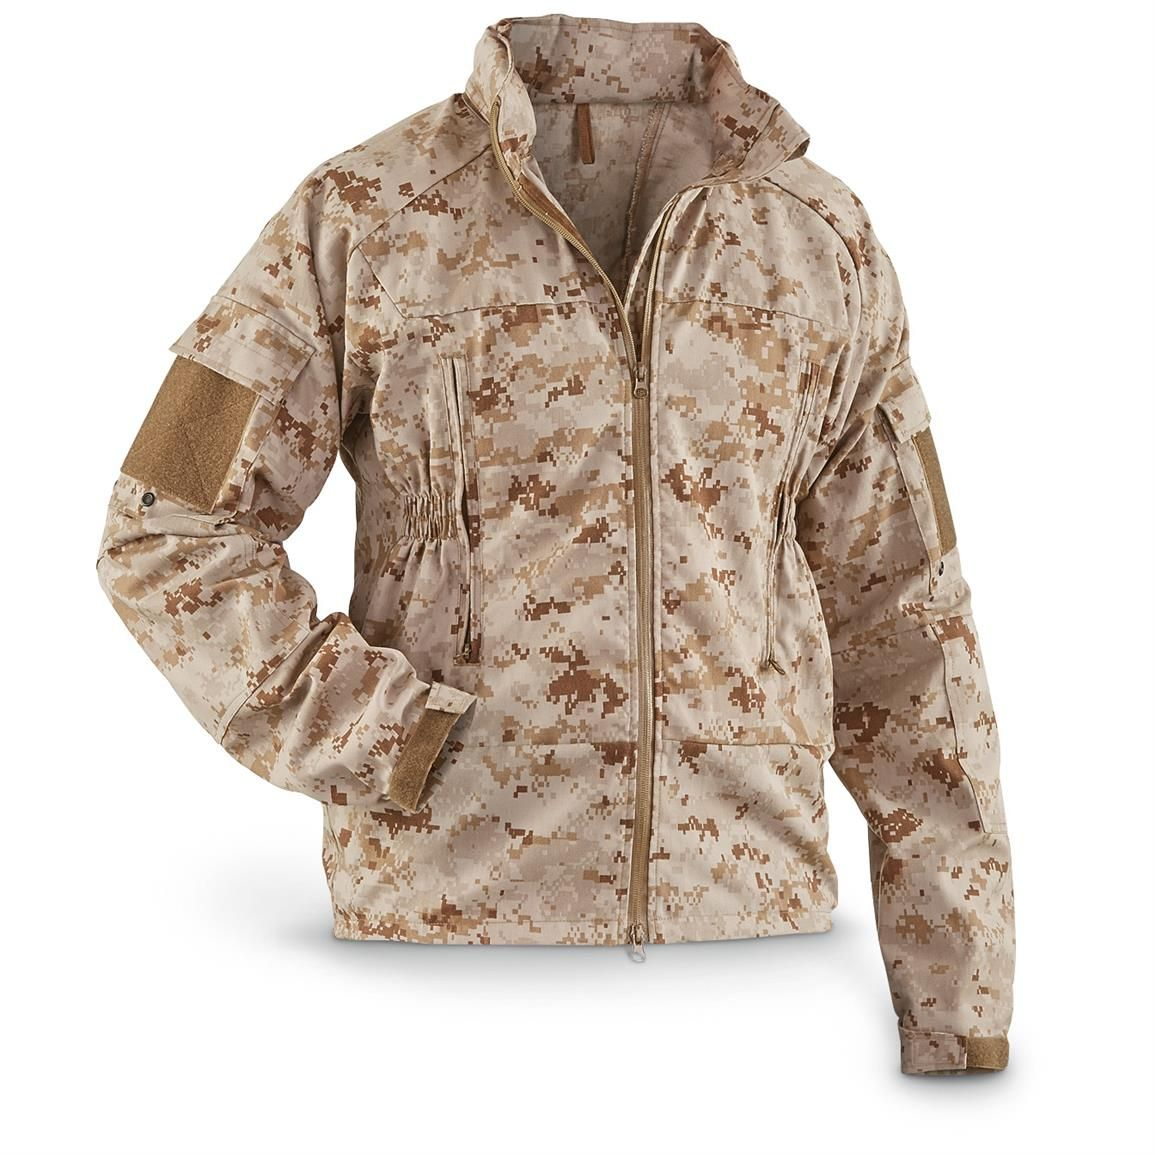 aafa900b742 New Men s USMC Military Surplus Digital Desert Frog Jacket